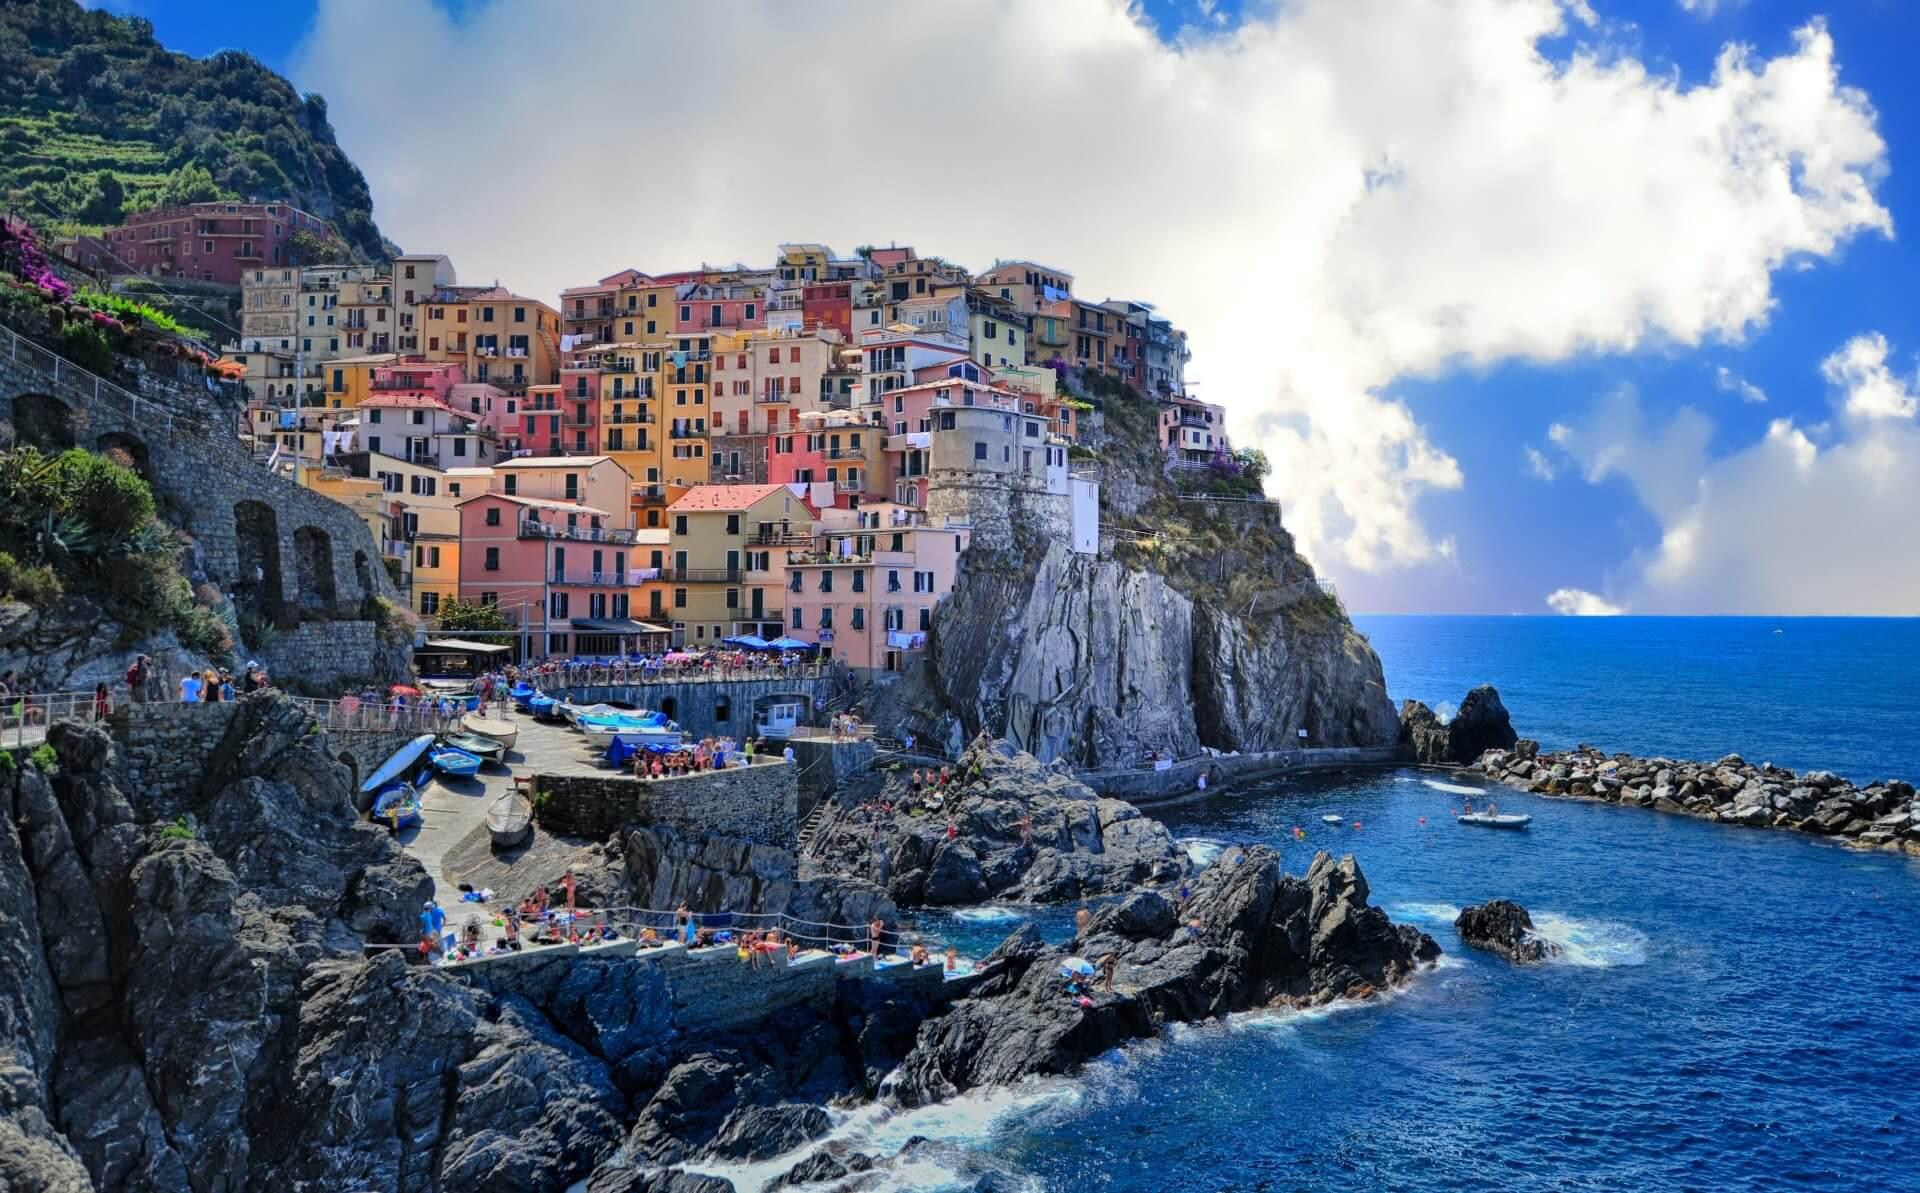 Guida viaggi in Liguria